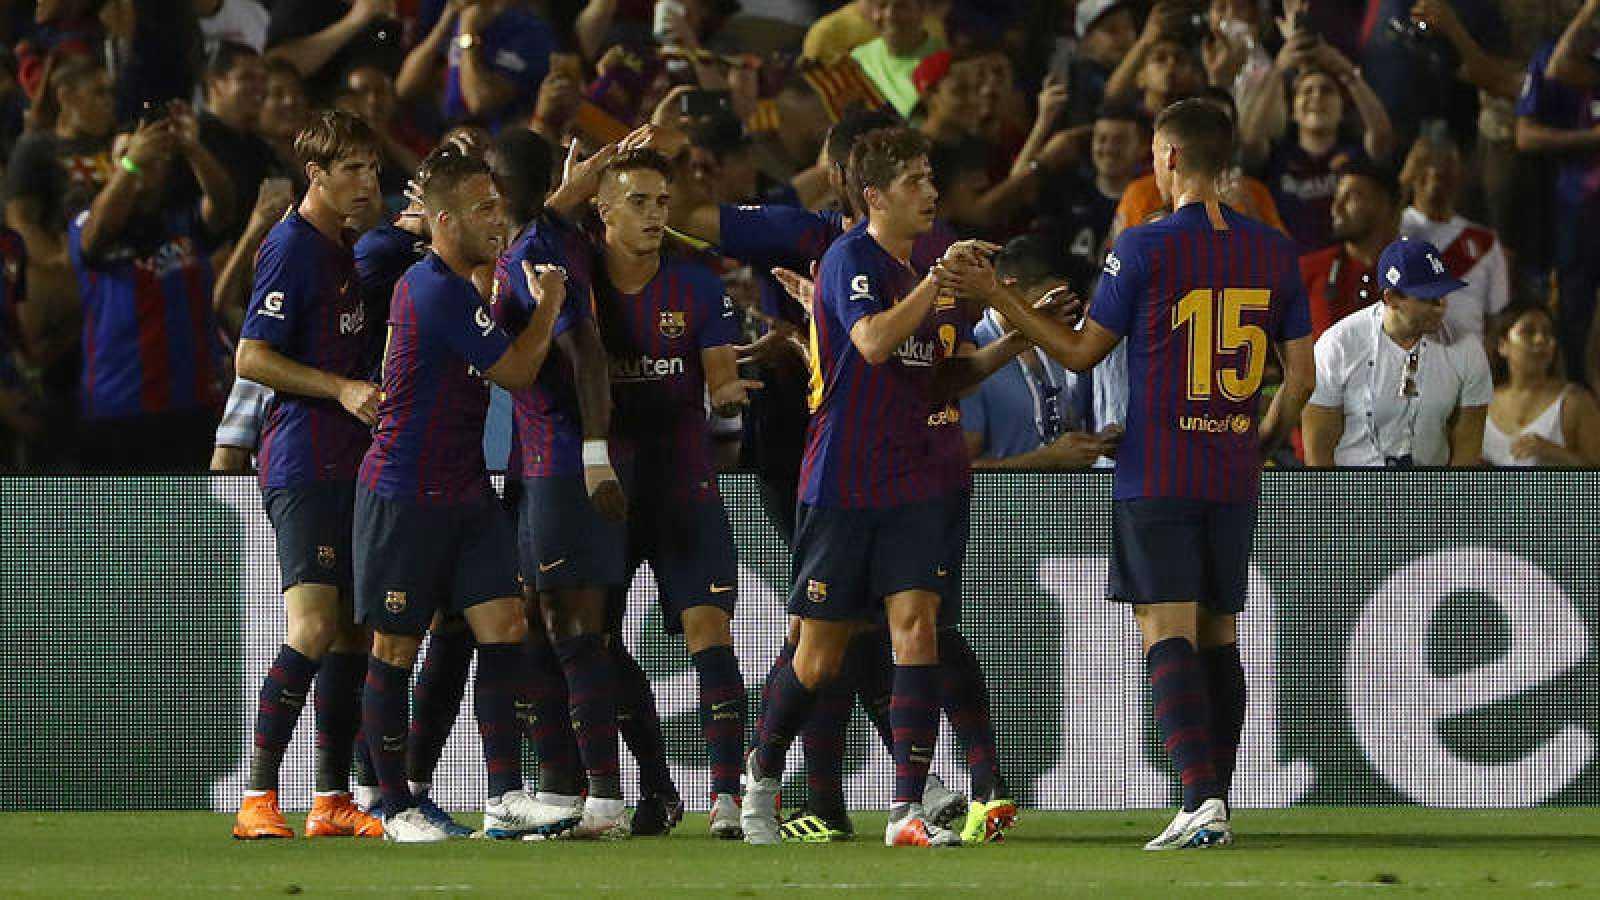 Un Barça con dos caras derrota al Tottenham en la tanda de penaltis